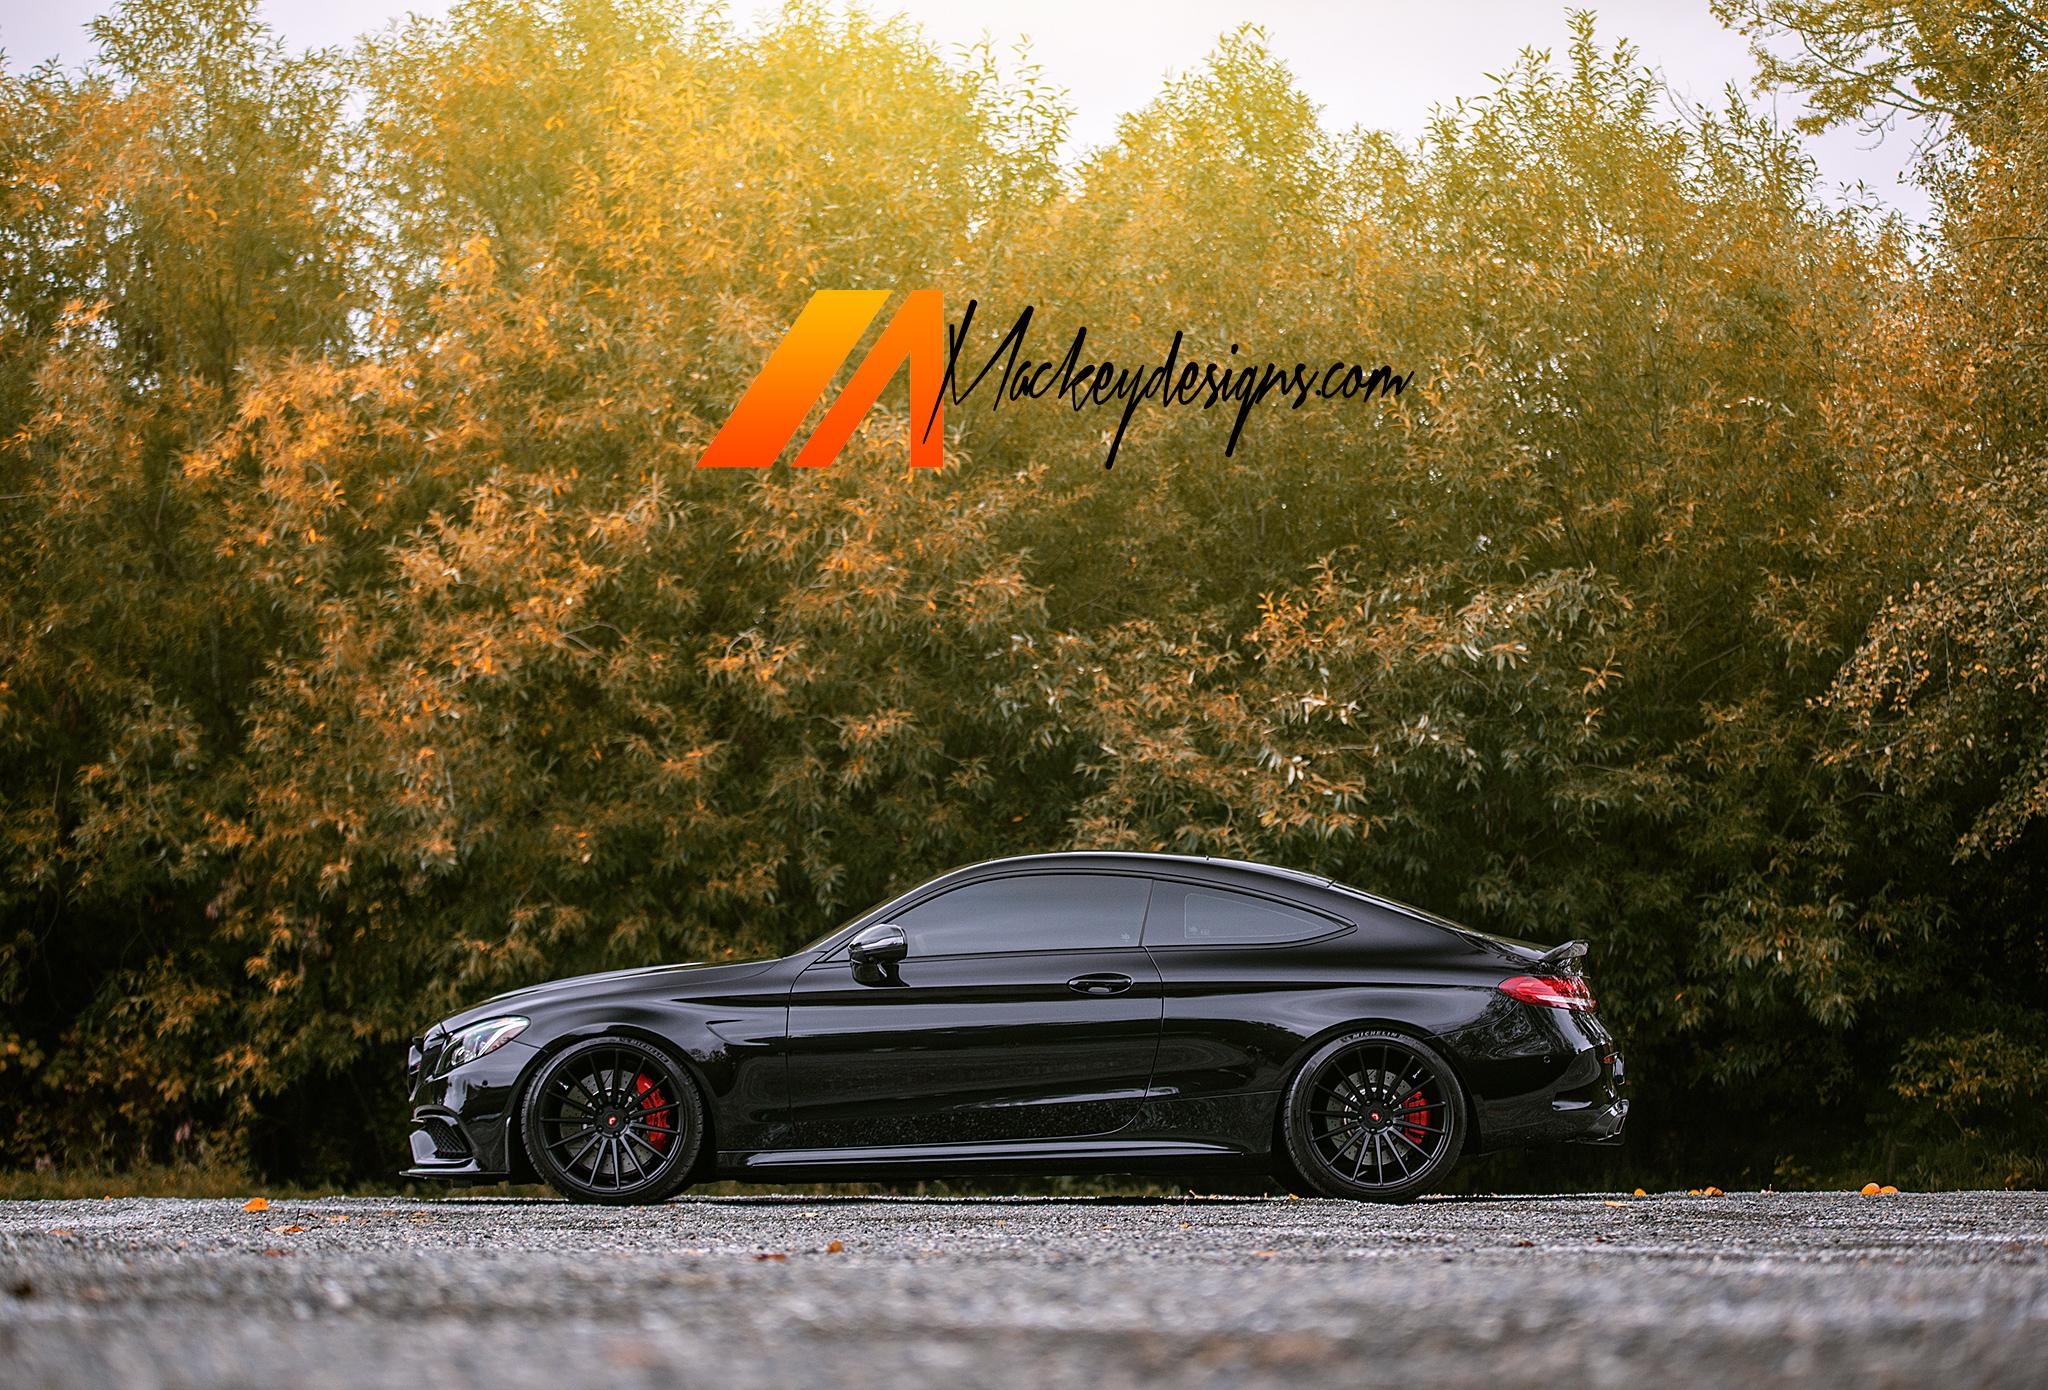 Mackeydesigns_Mercedes_C63S-18.jpg